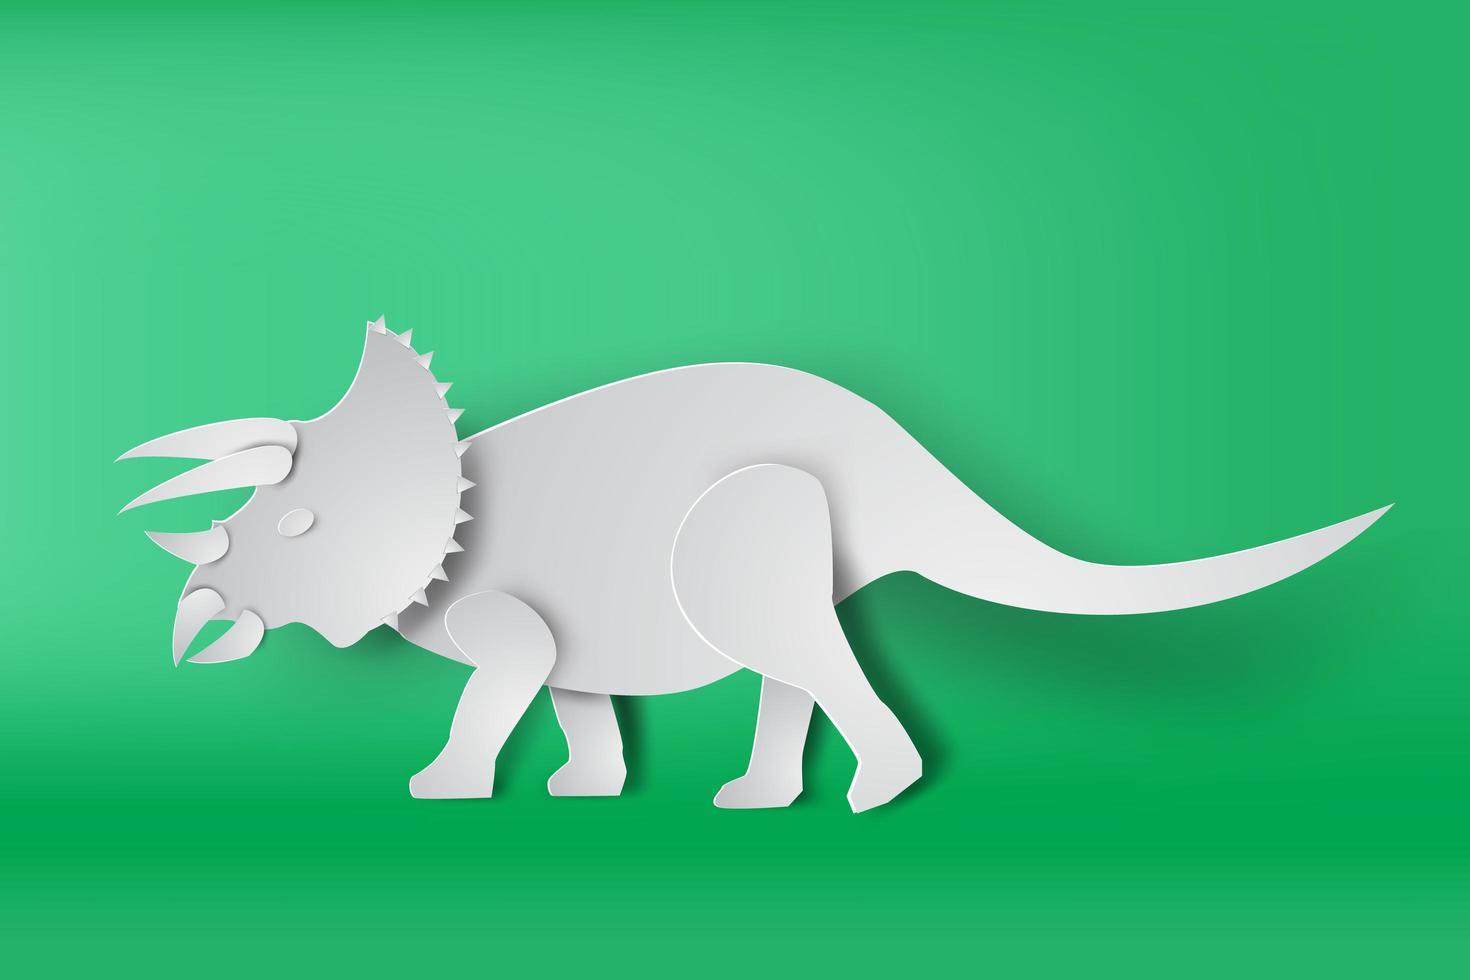 papier kunst triceratops dinosaurus vector